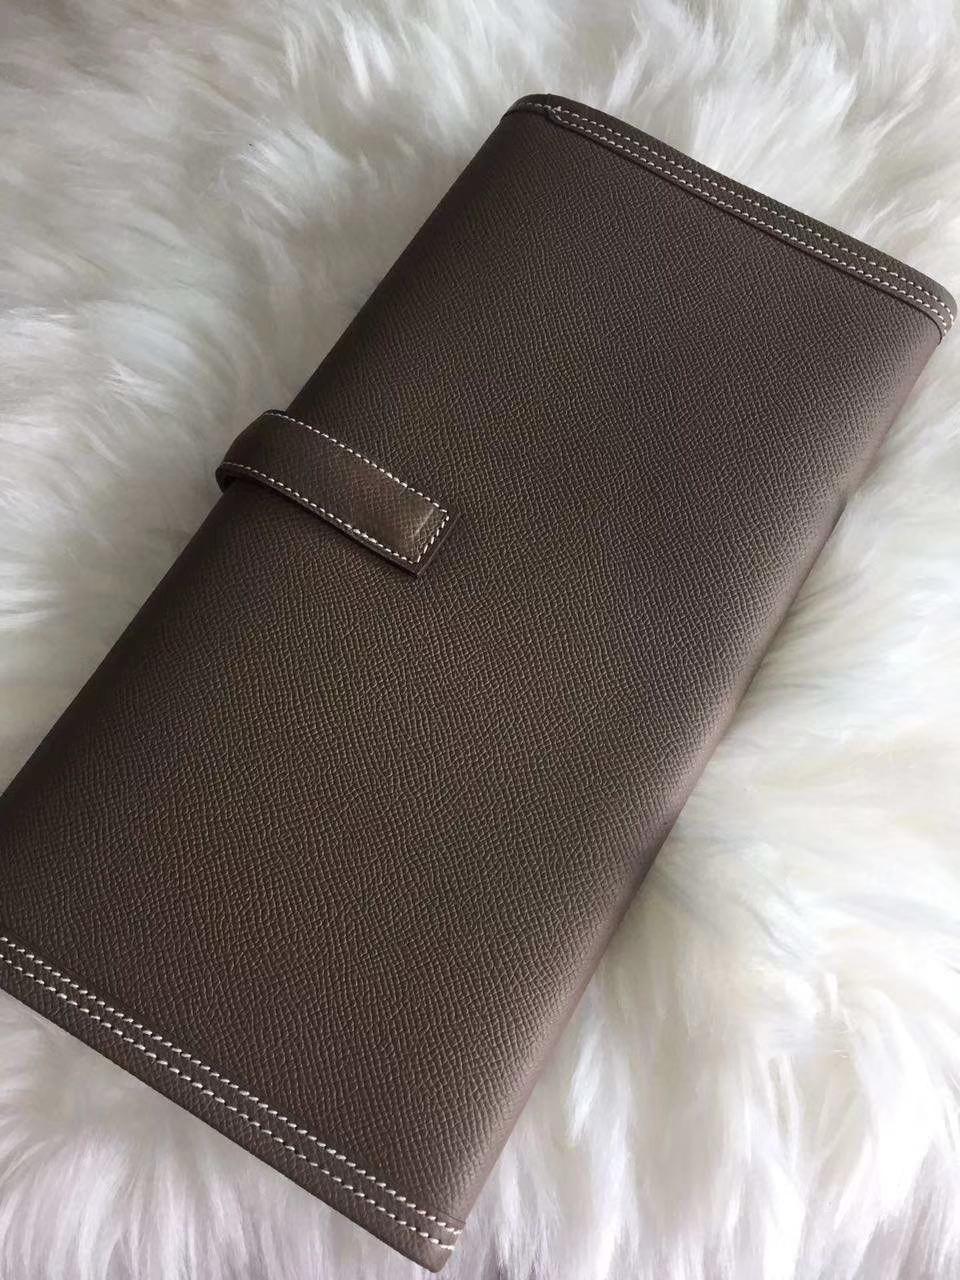 Hermès(爱马仕)29jige 手包 原装等级进口epsom皮 大象灰 订单出货 现货